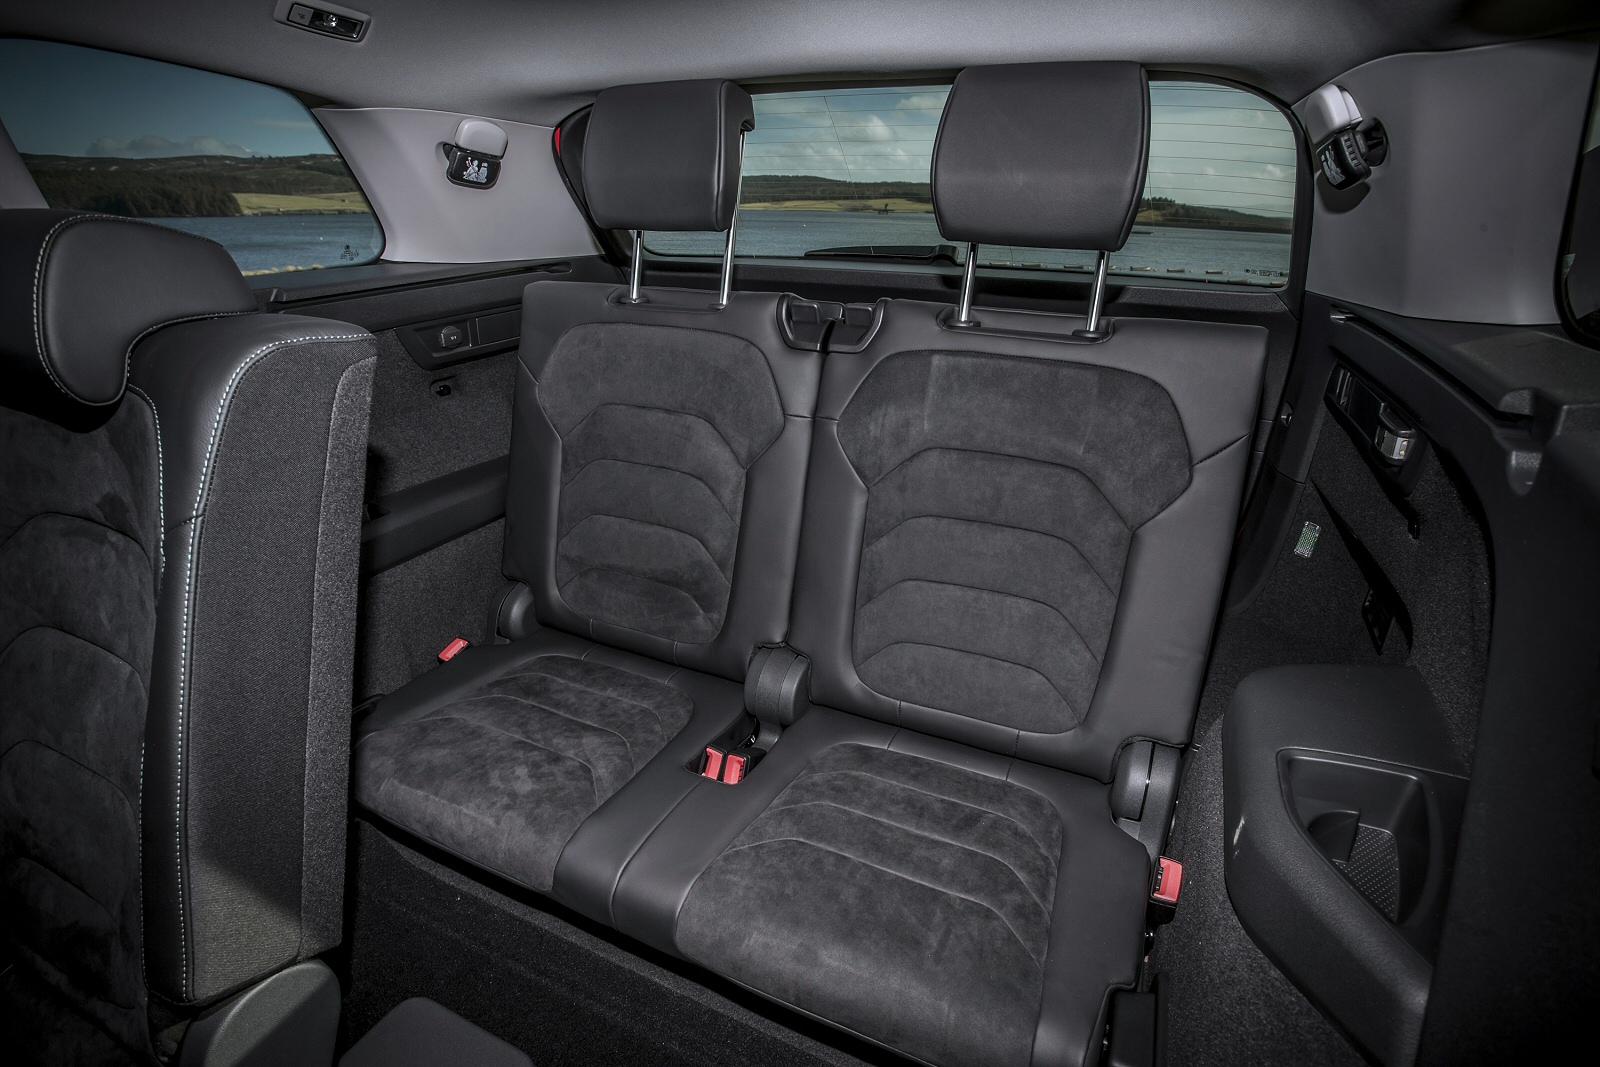 14 Tsi 150 Se L 4X4 5Dr 7 Seat Petrol Estate